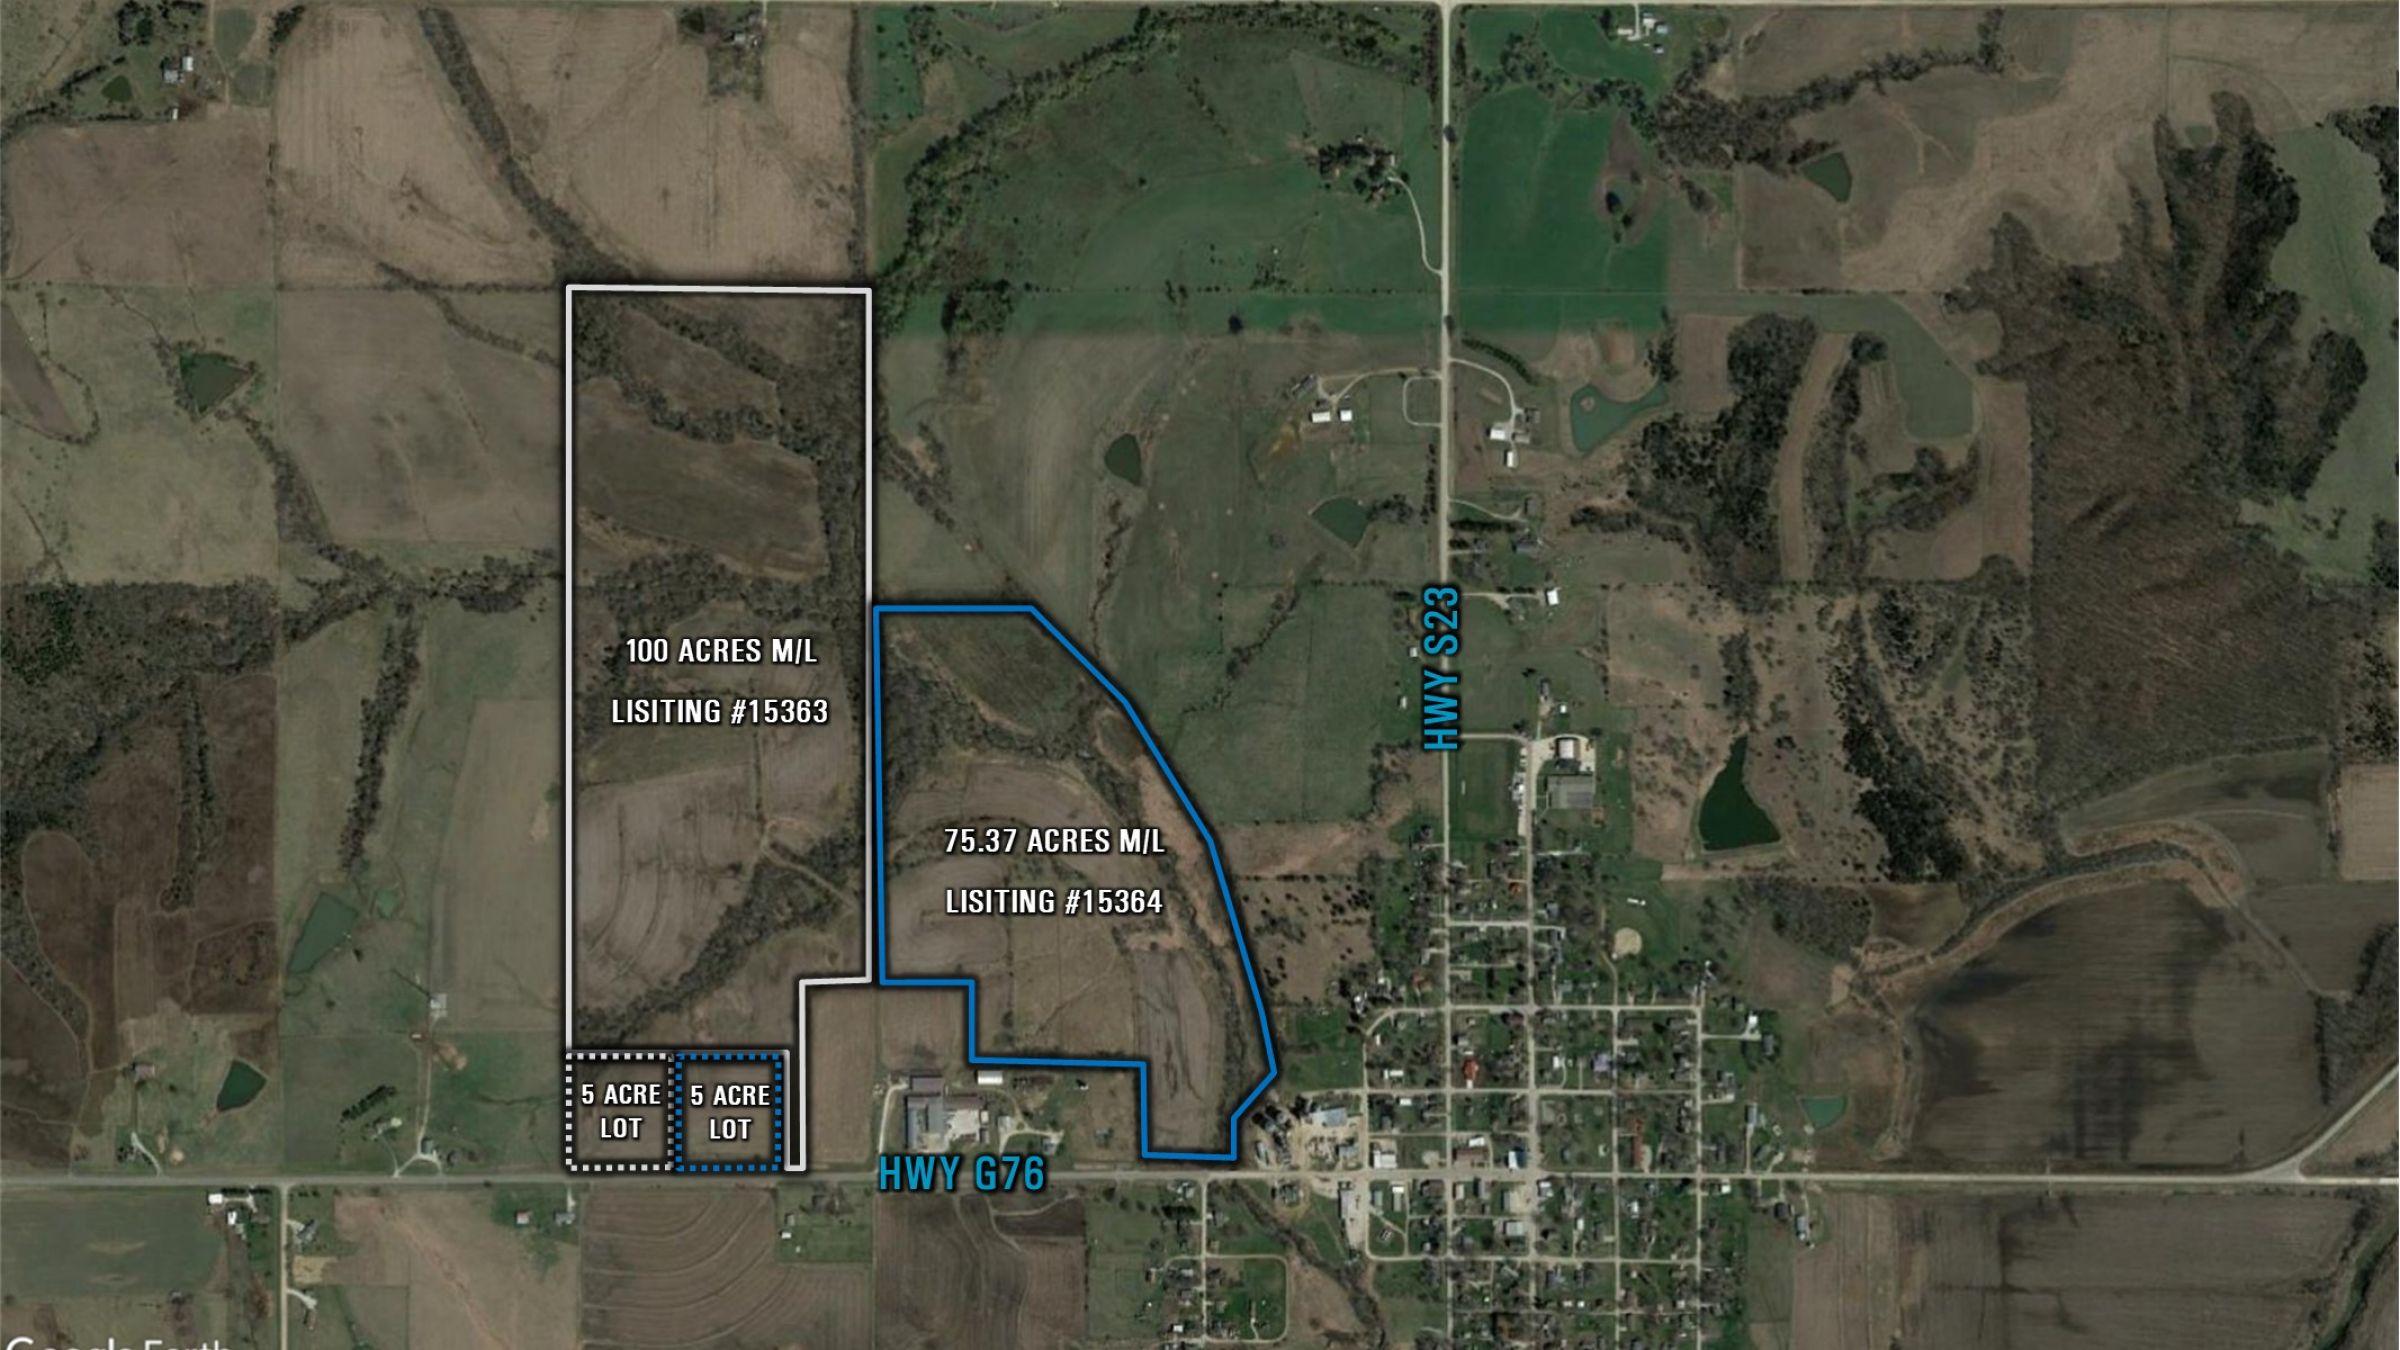 land-warren-county-iowa-5-acres-listing-number-15400-0-2021-03-08-175821.jpg